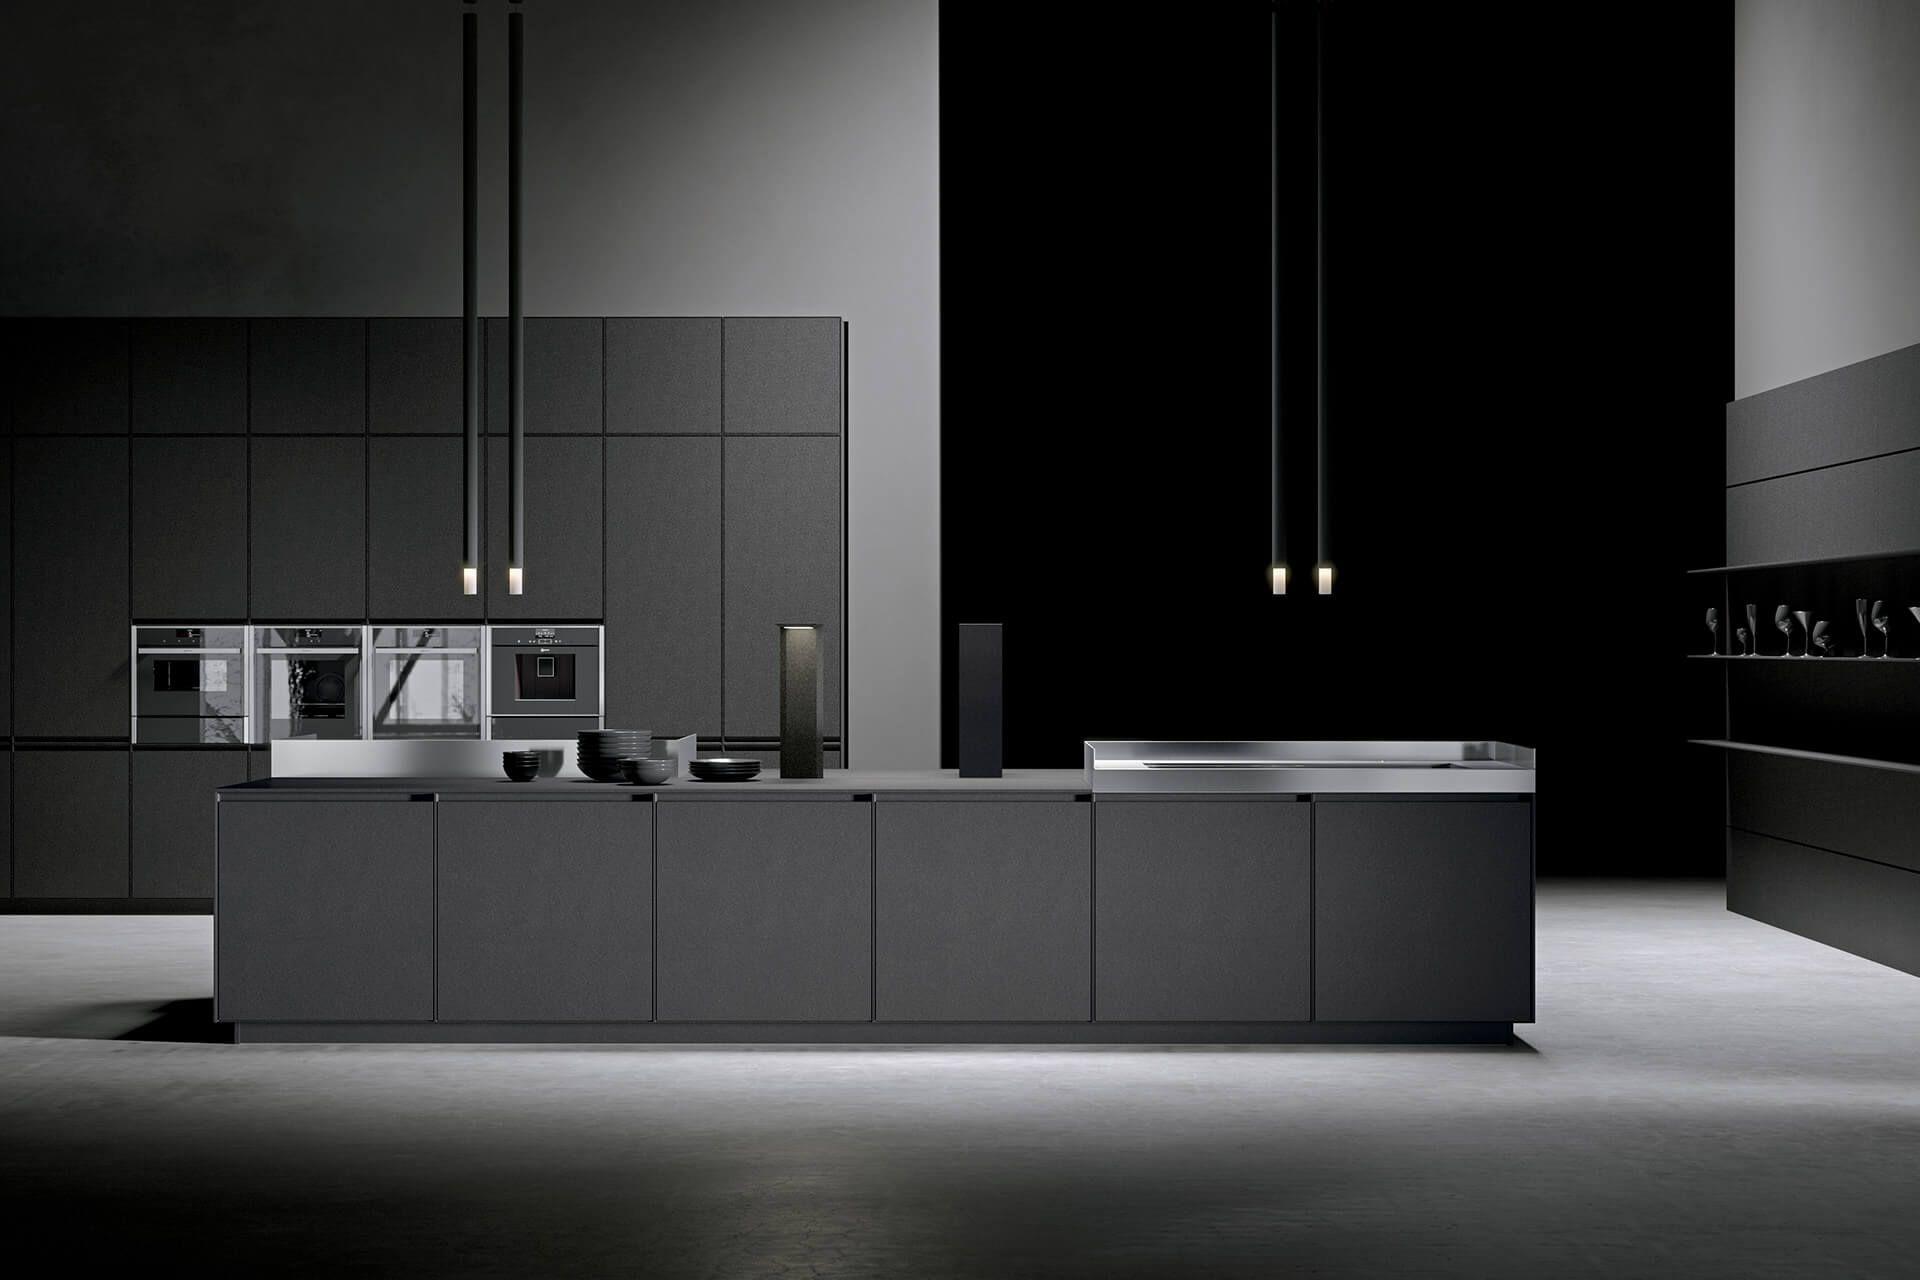 Pin De Madrid Forest En The Kitchen By Madrid Forest Diseno De